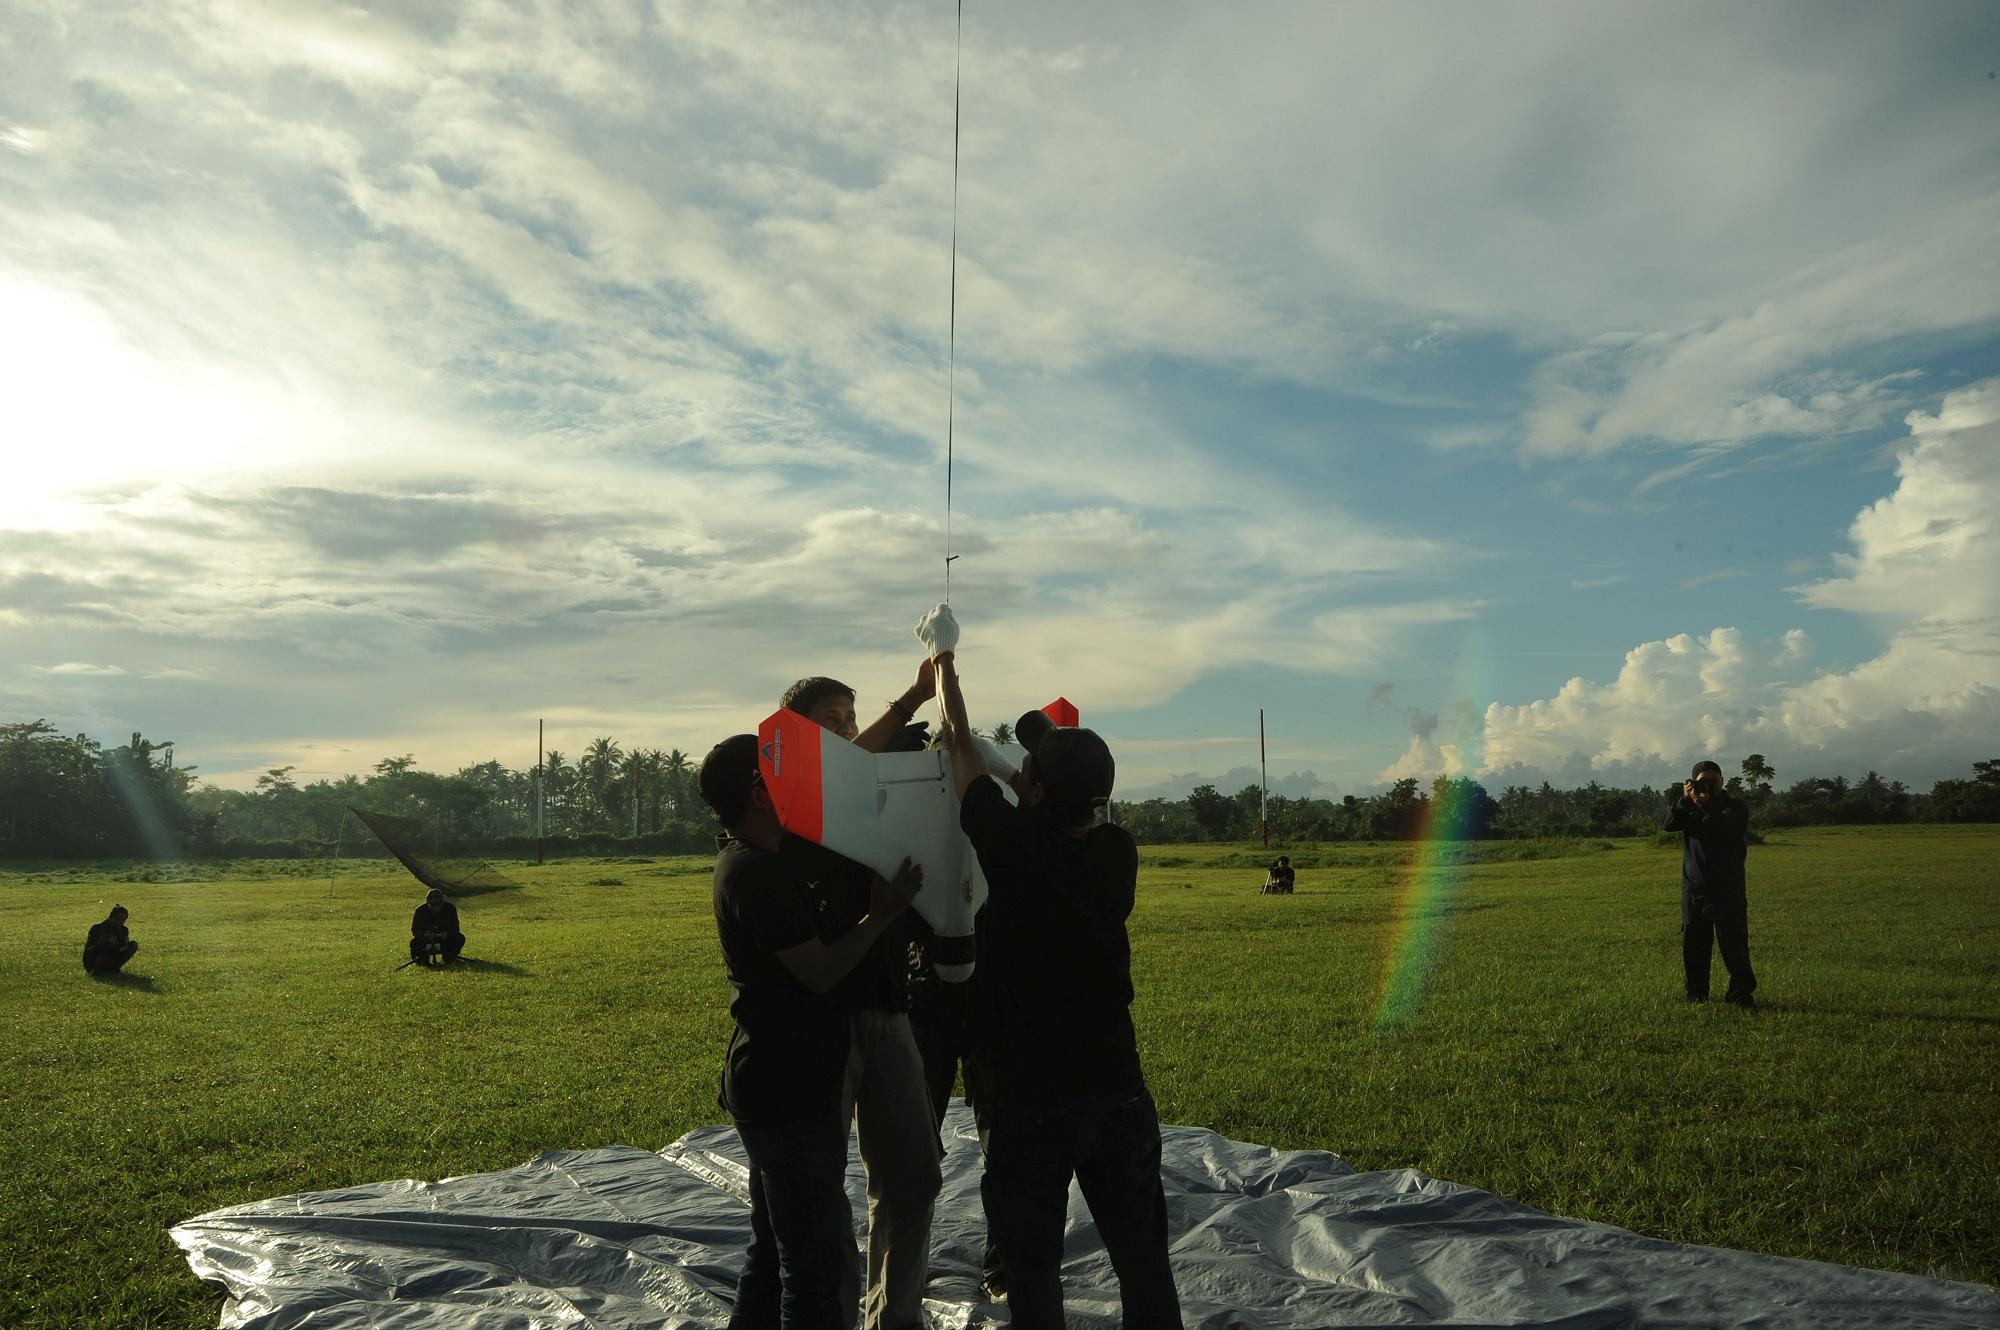 UAV Ai-X1 diterbangkan dengan bantuan balon cuaca yang pada ketinggian 14 Km akan pecah dan pesawat akan terbang dengan sendirinya (foto: Menembus Langit)